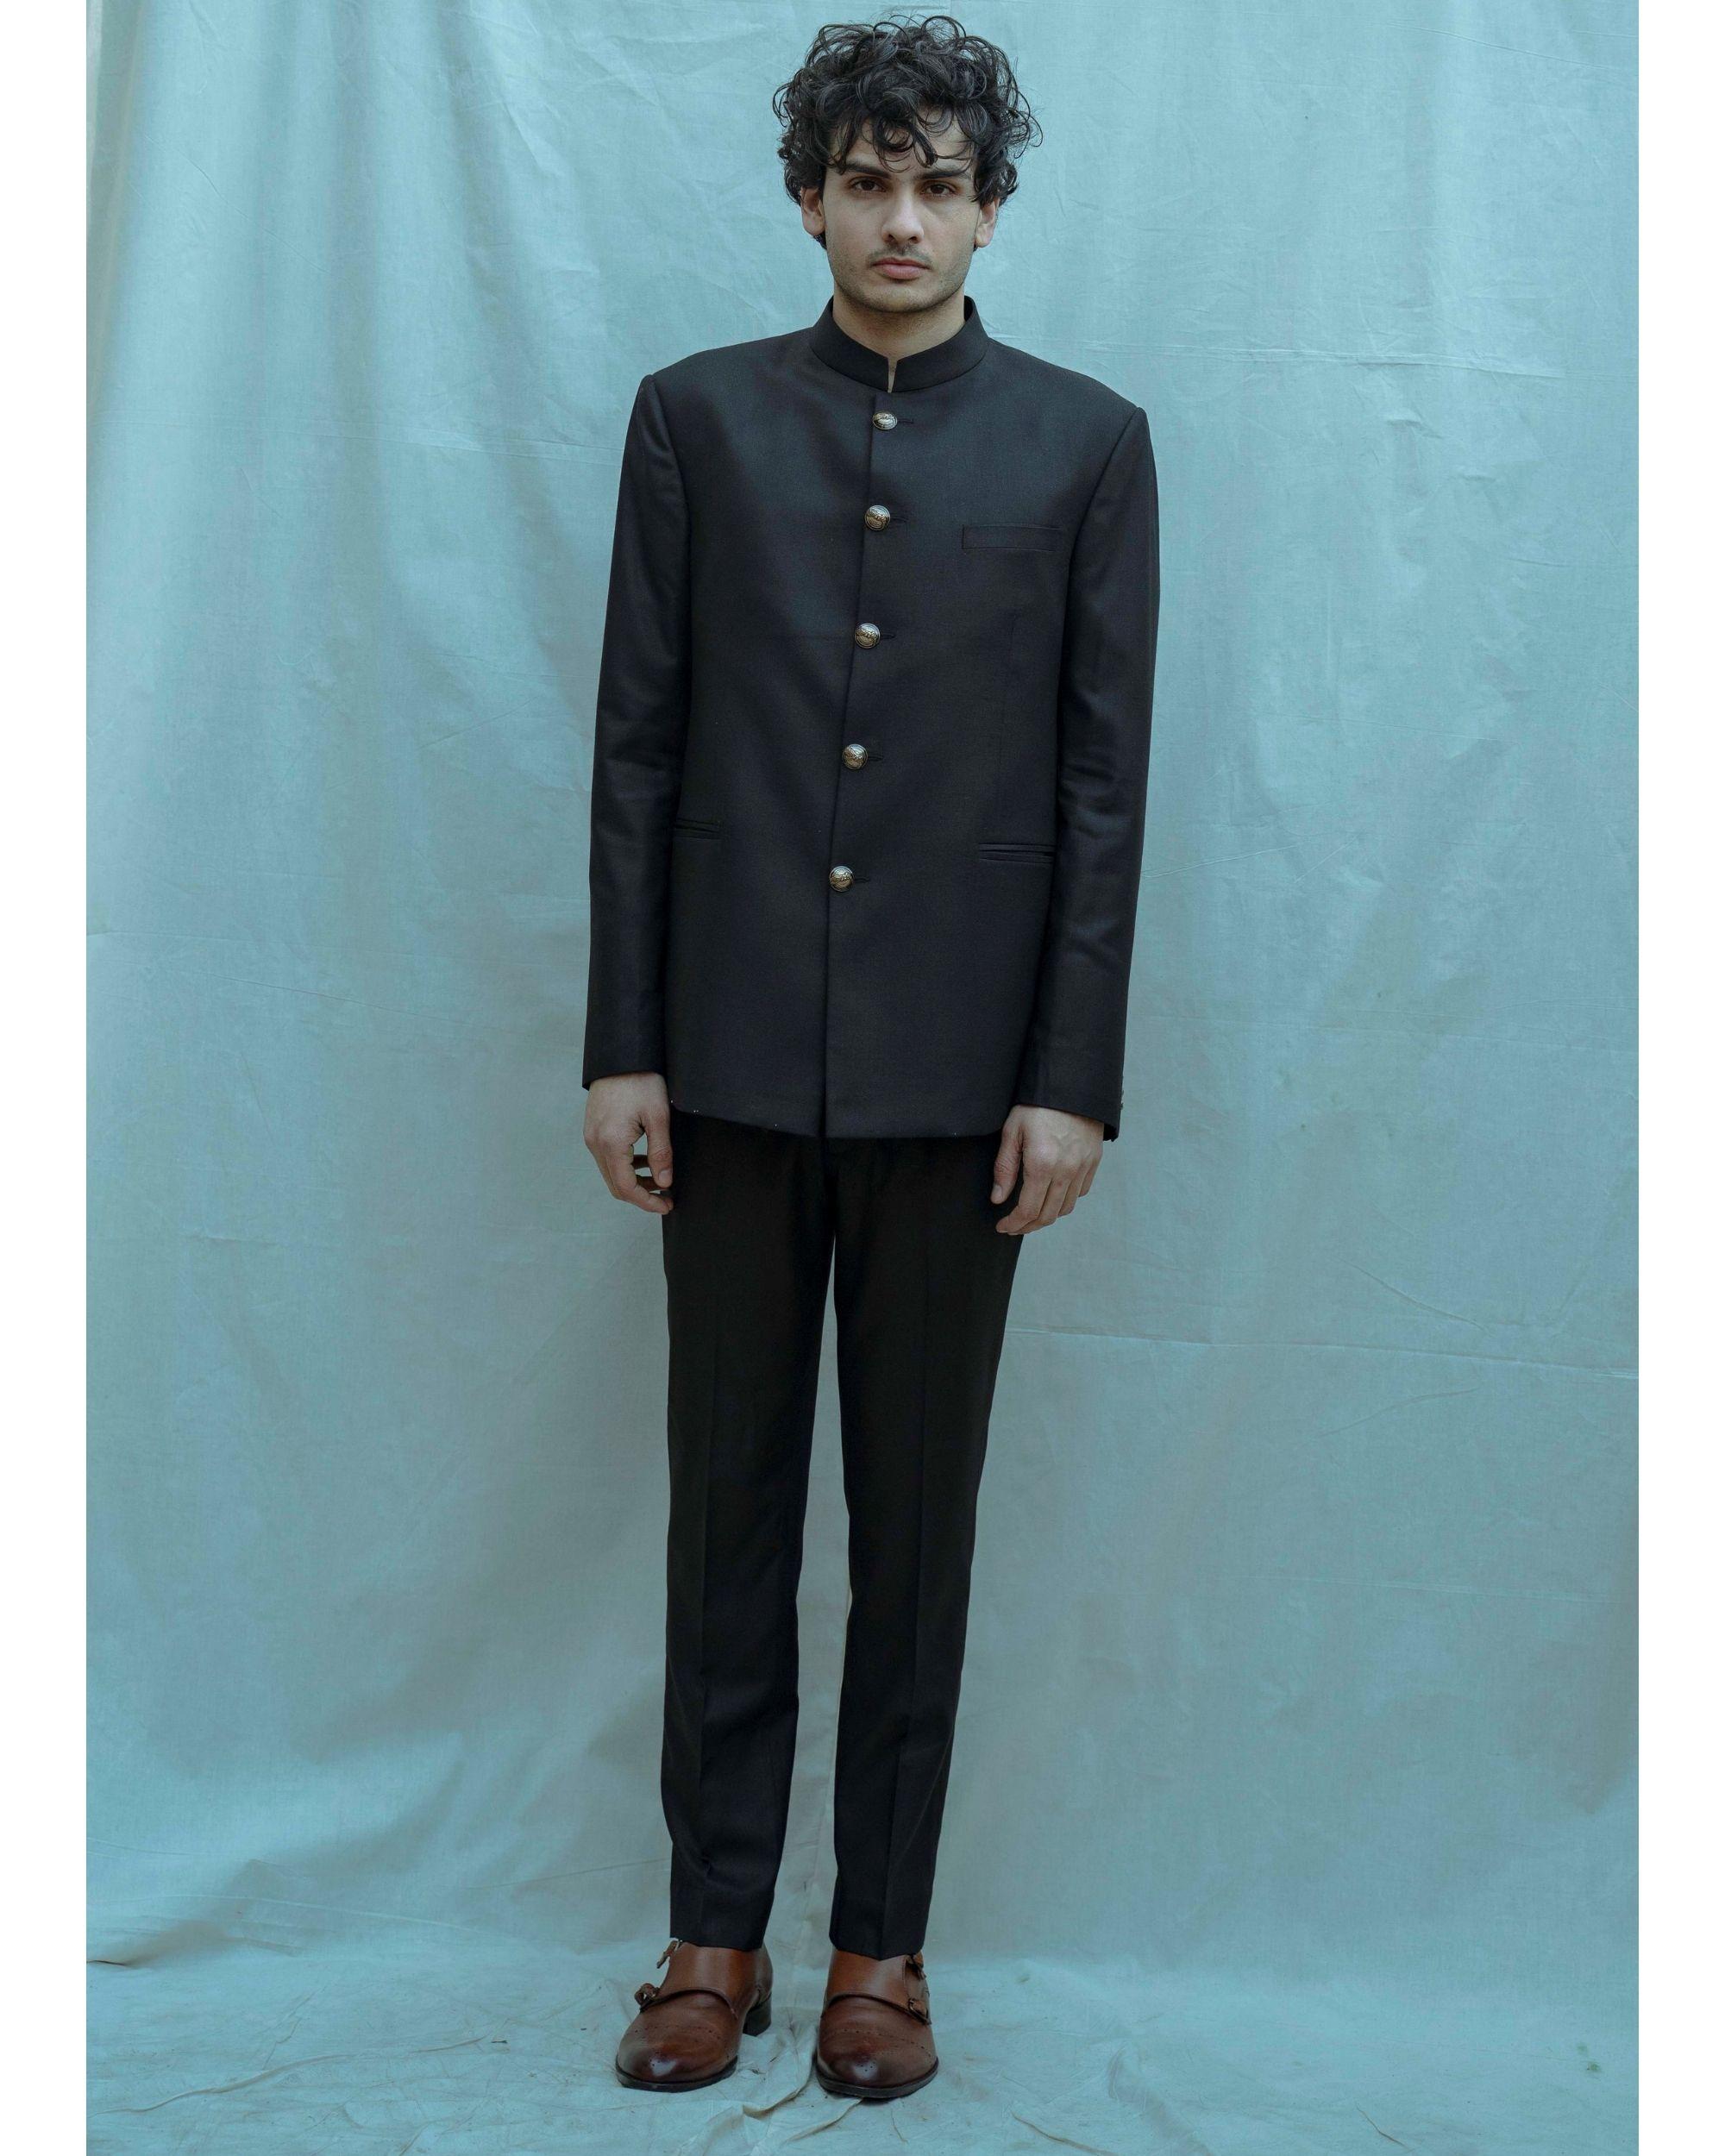 Black bandgala and white shirt with pants - Set Of Three